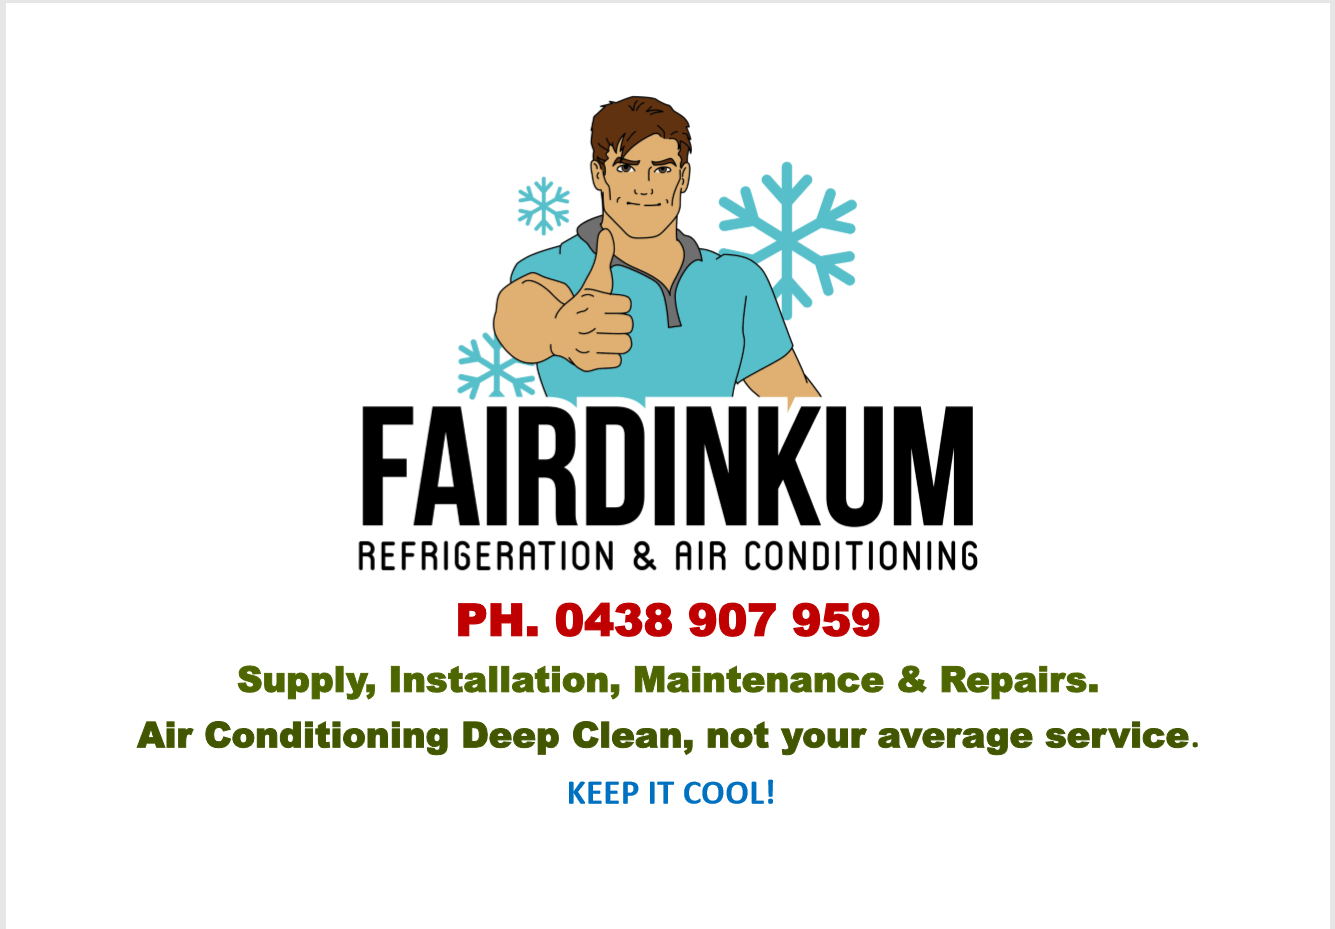 Fairdinkum Refrigeration and Air Conditioning